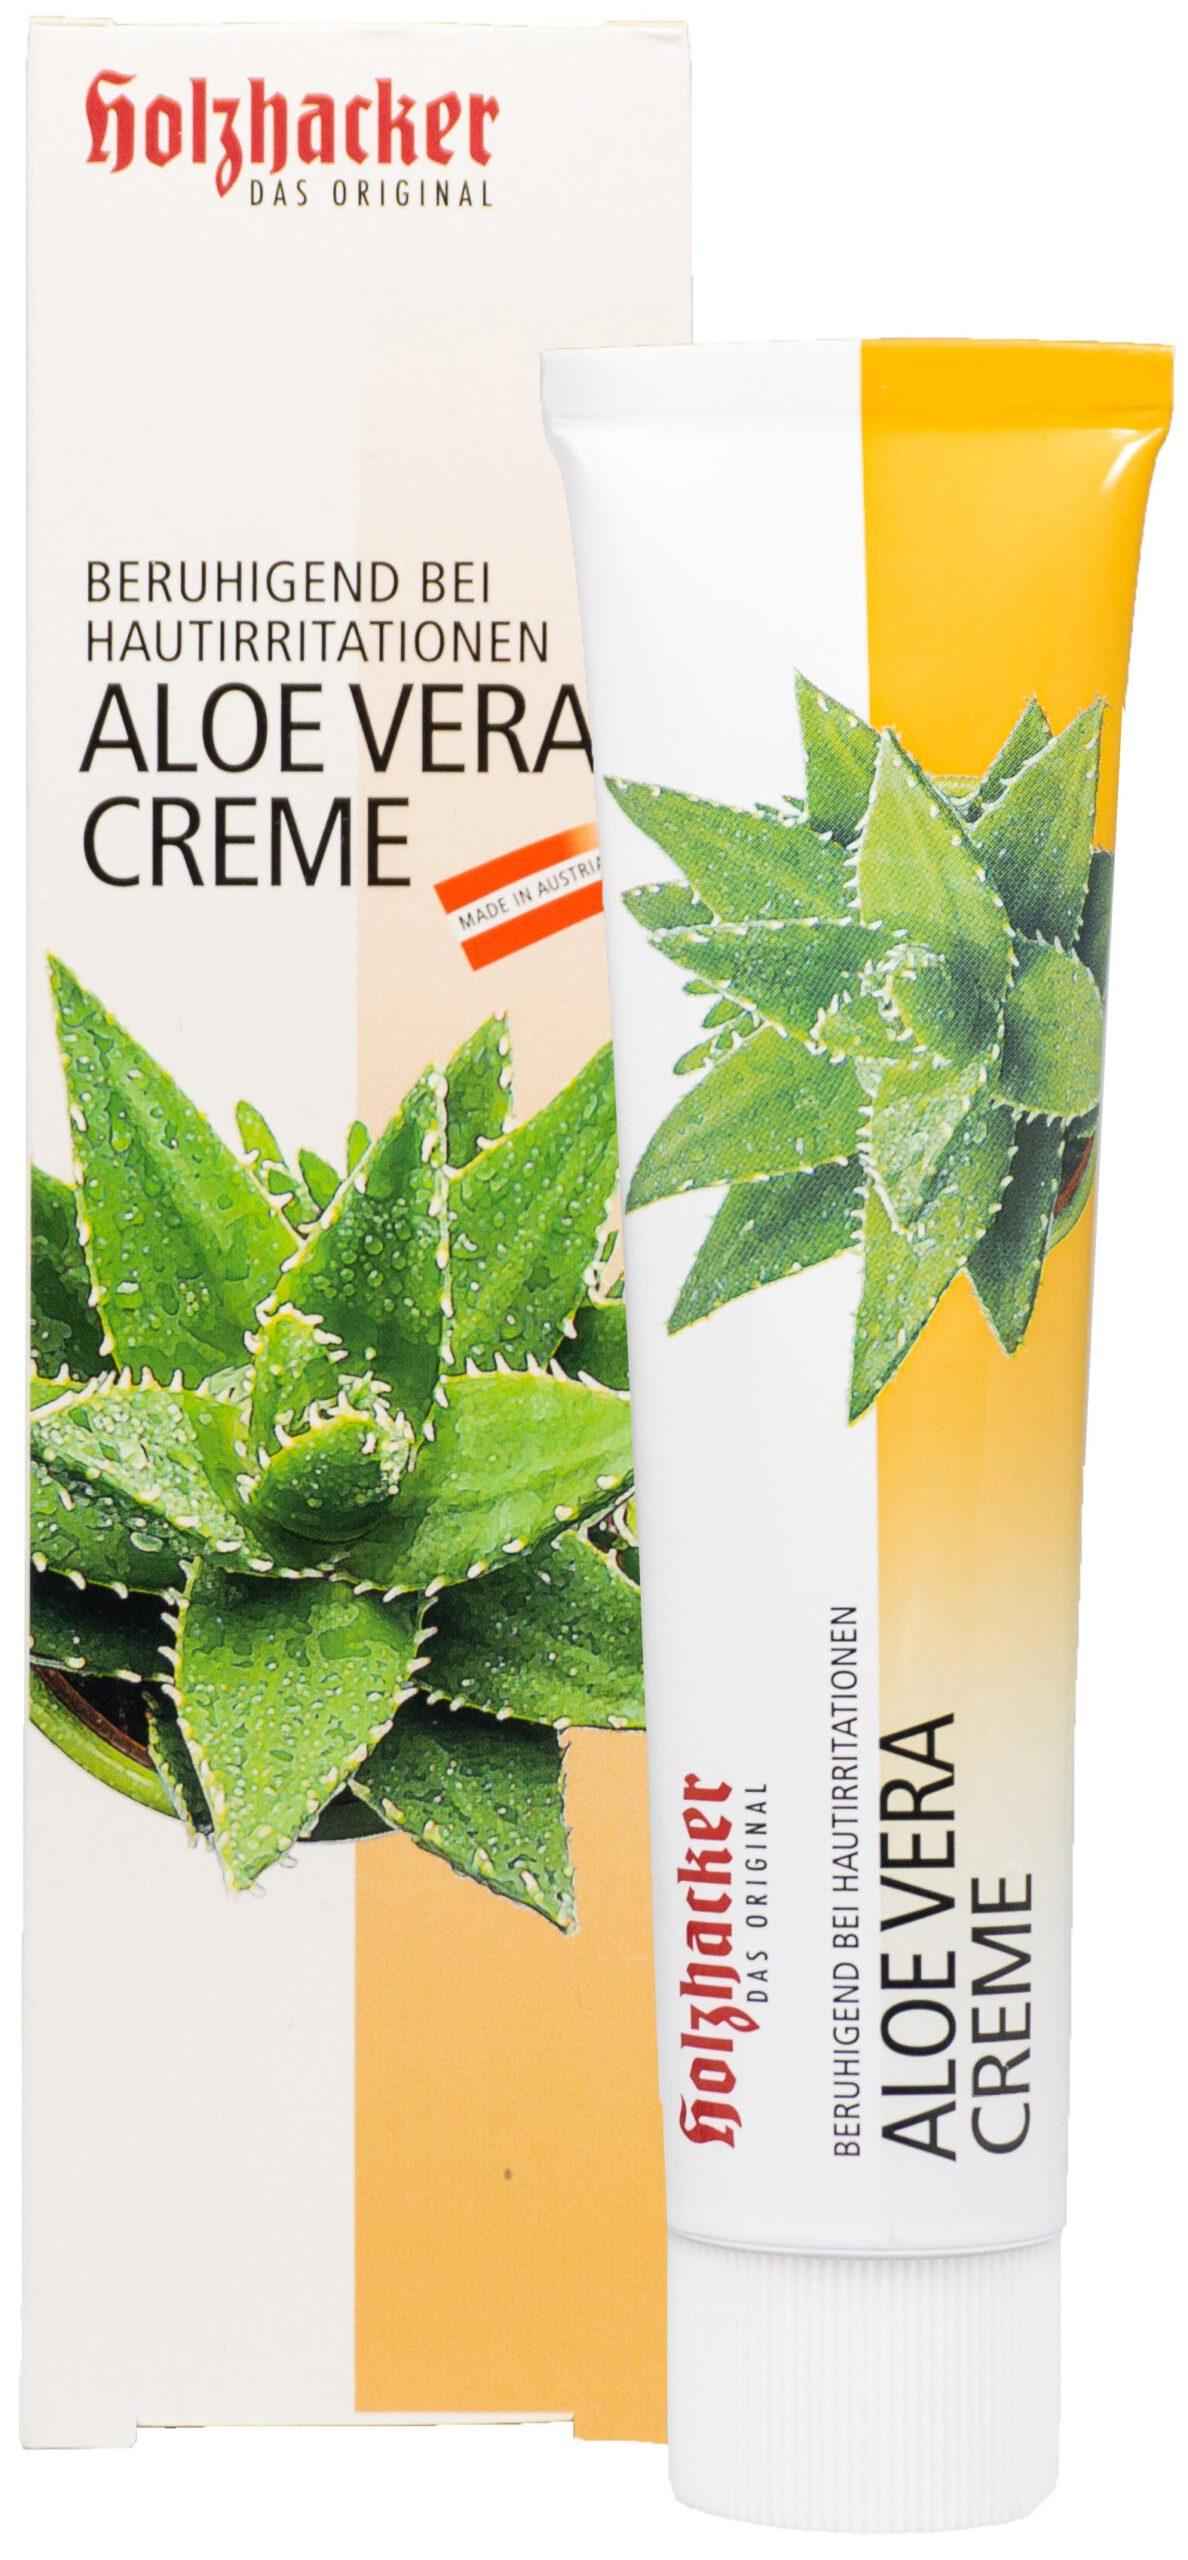 Aloe Vera Creme Image